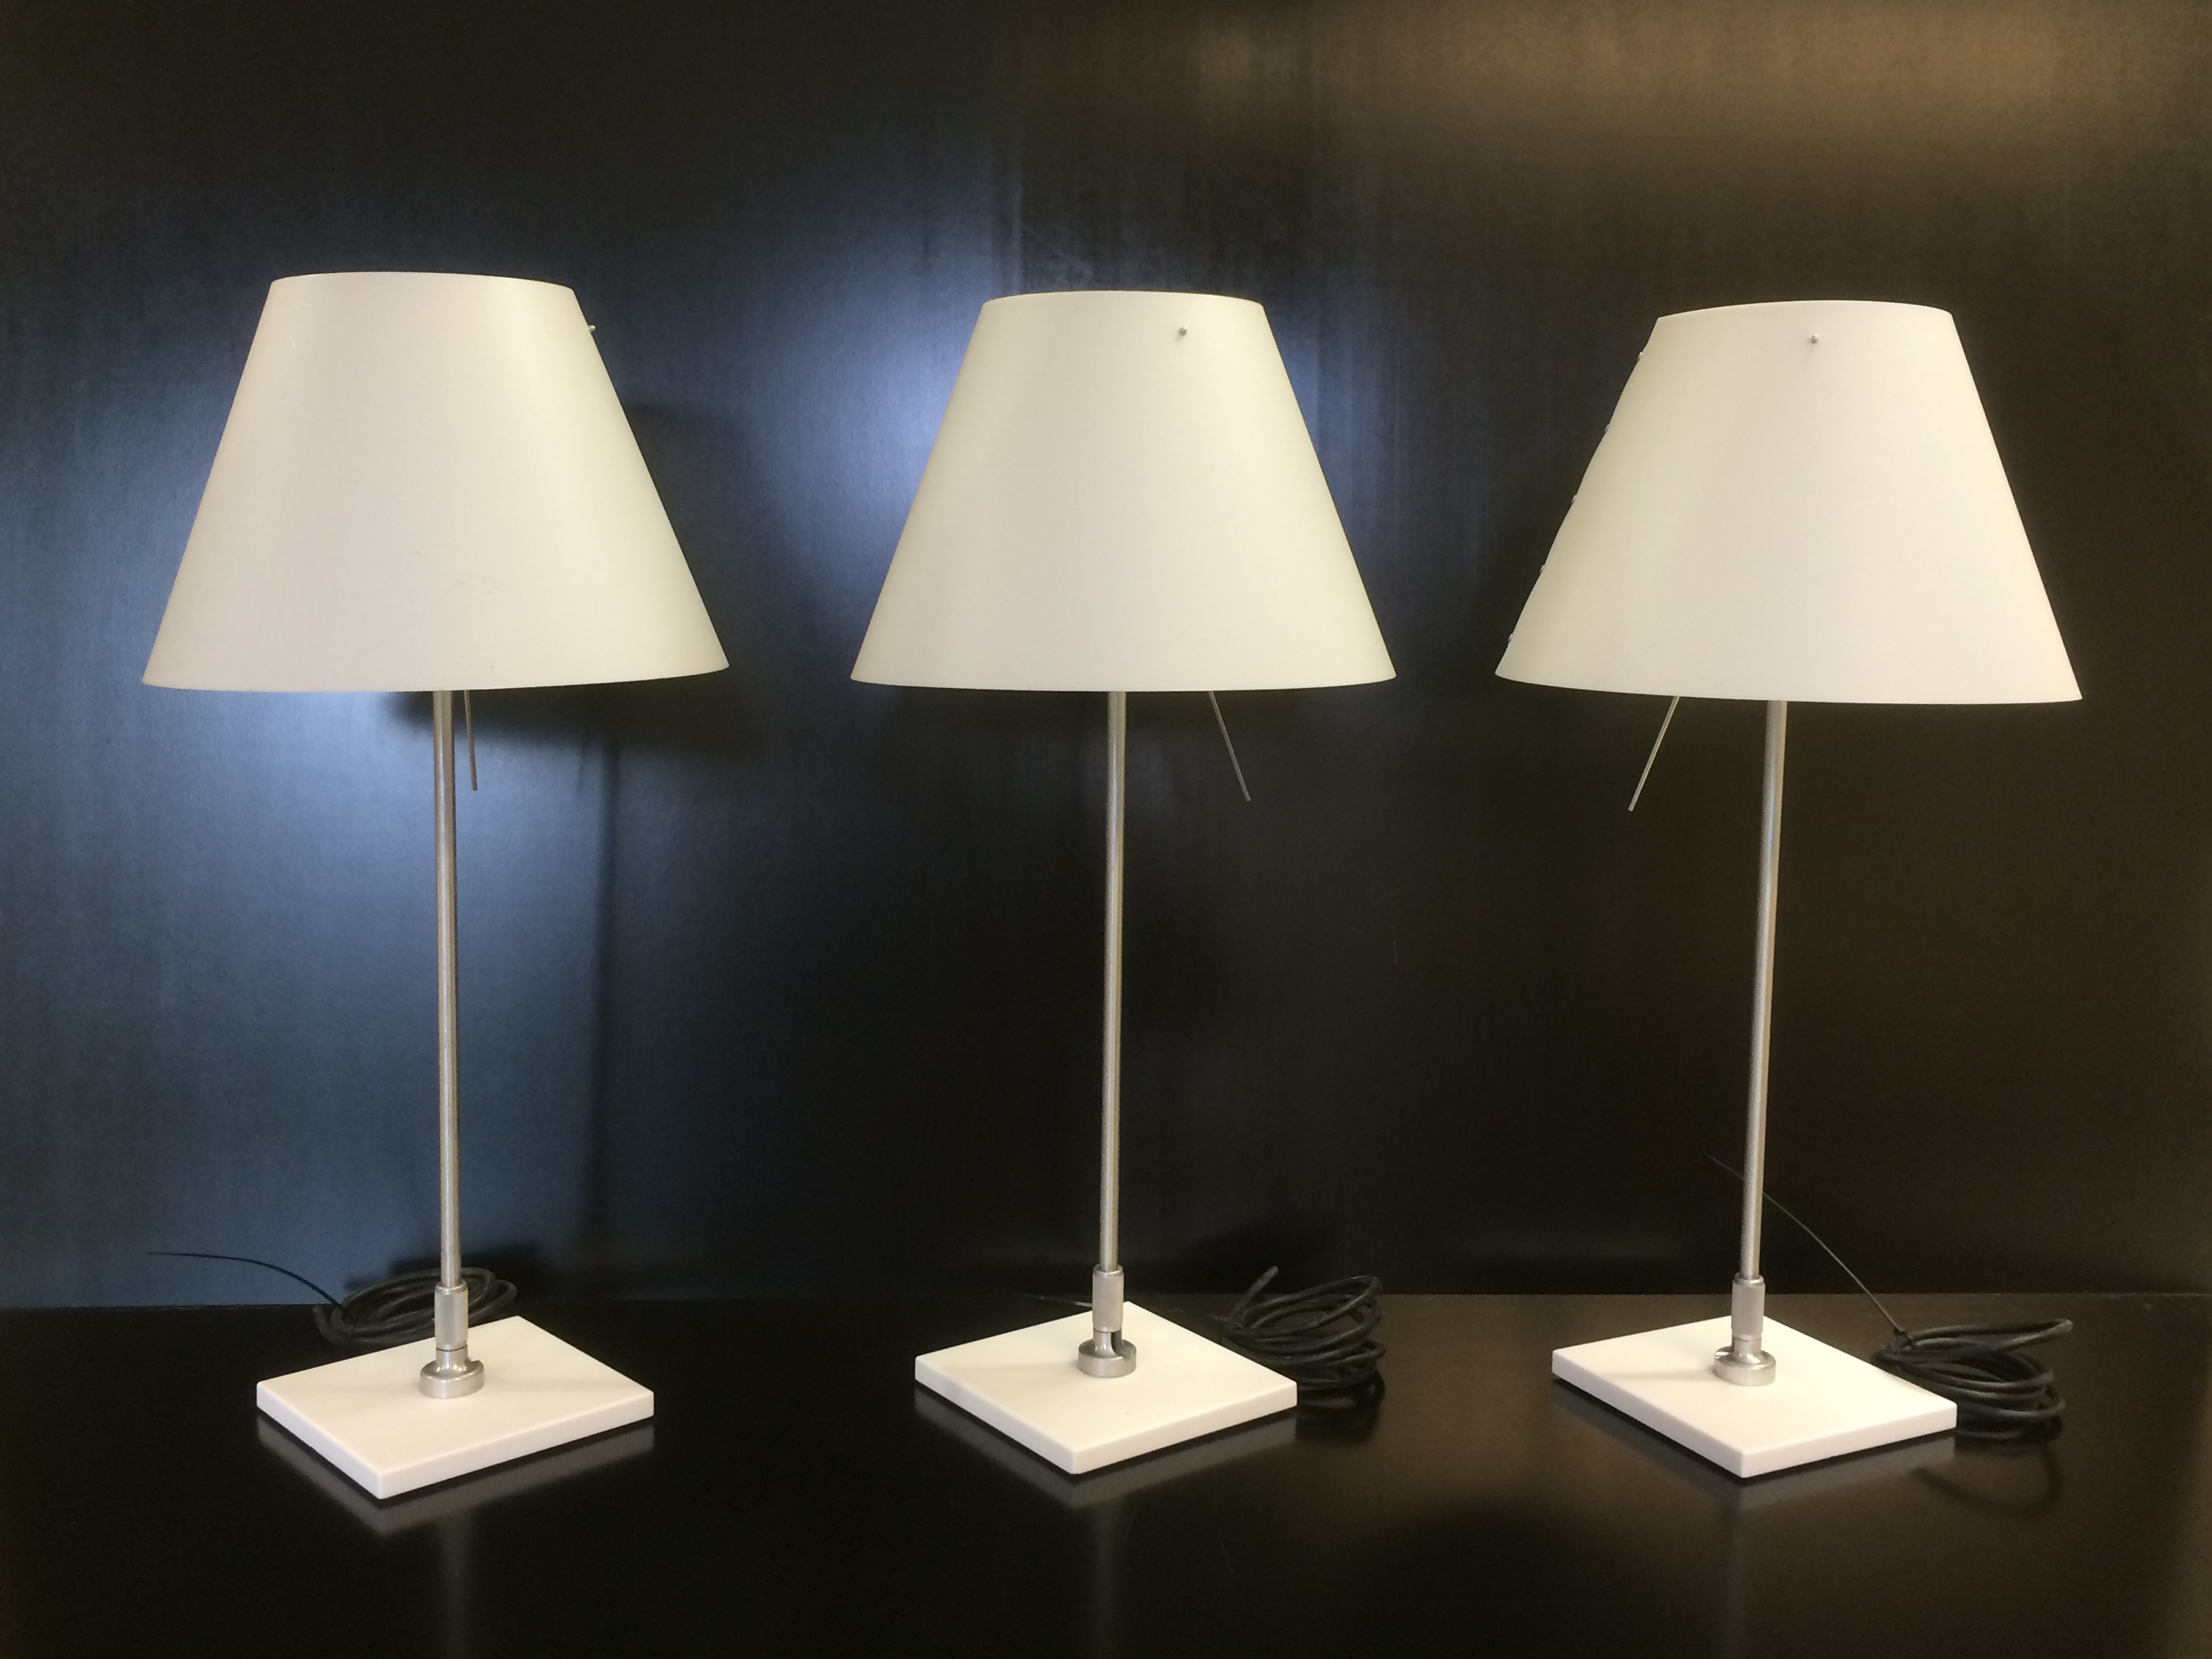 Luceplan Costanzina tafellampen op rij